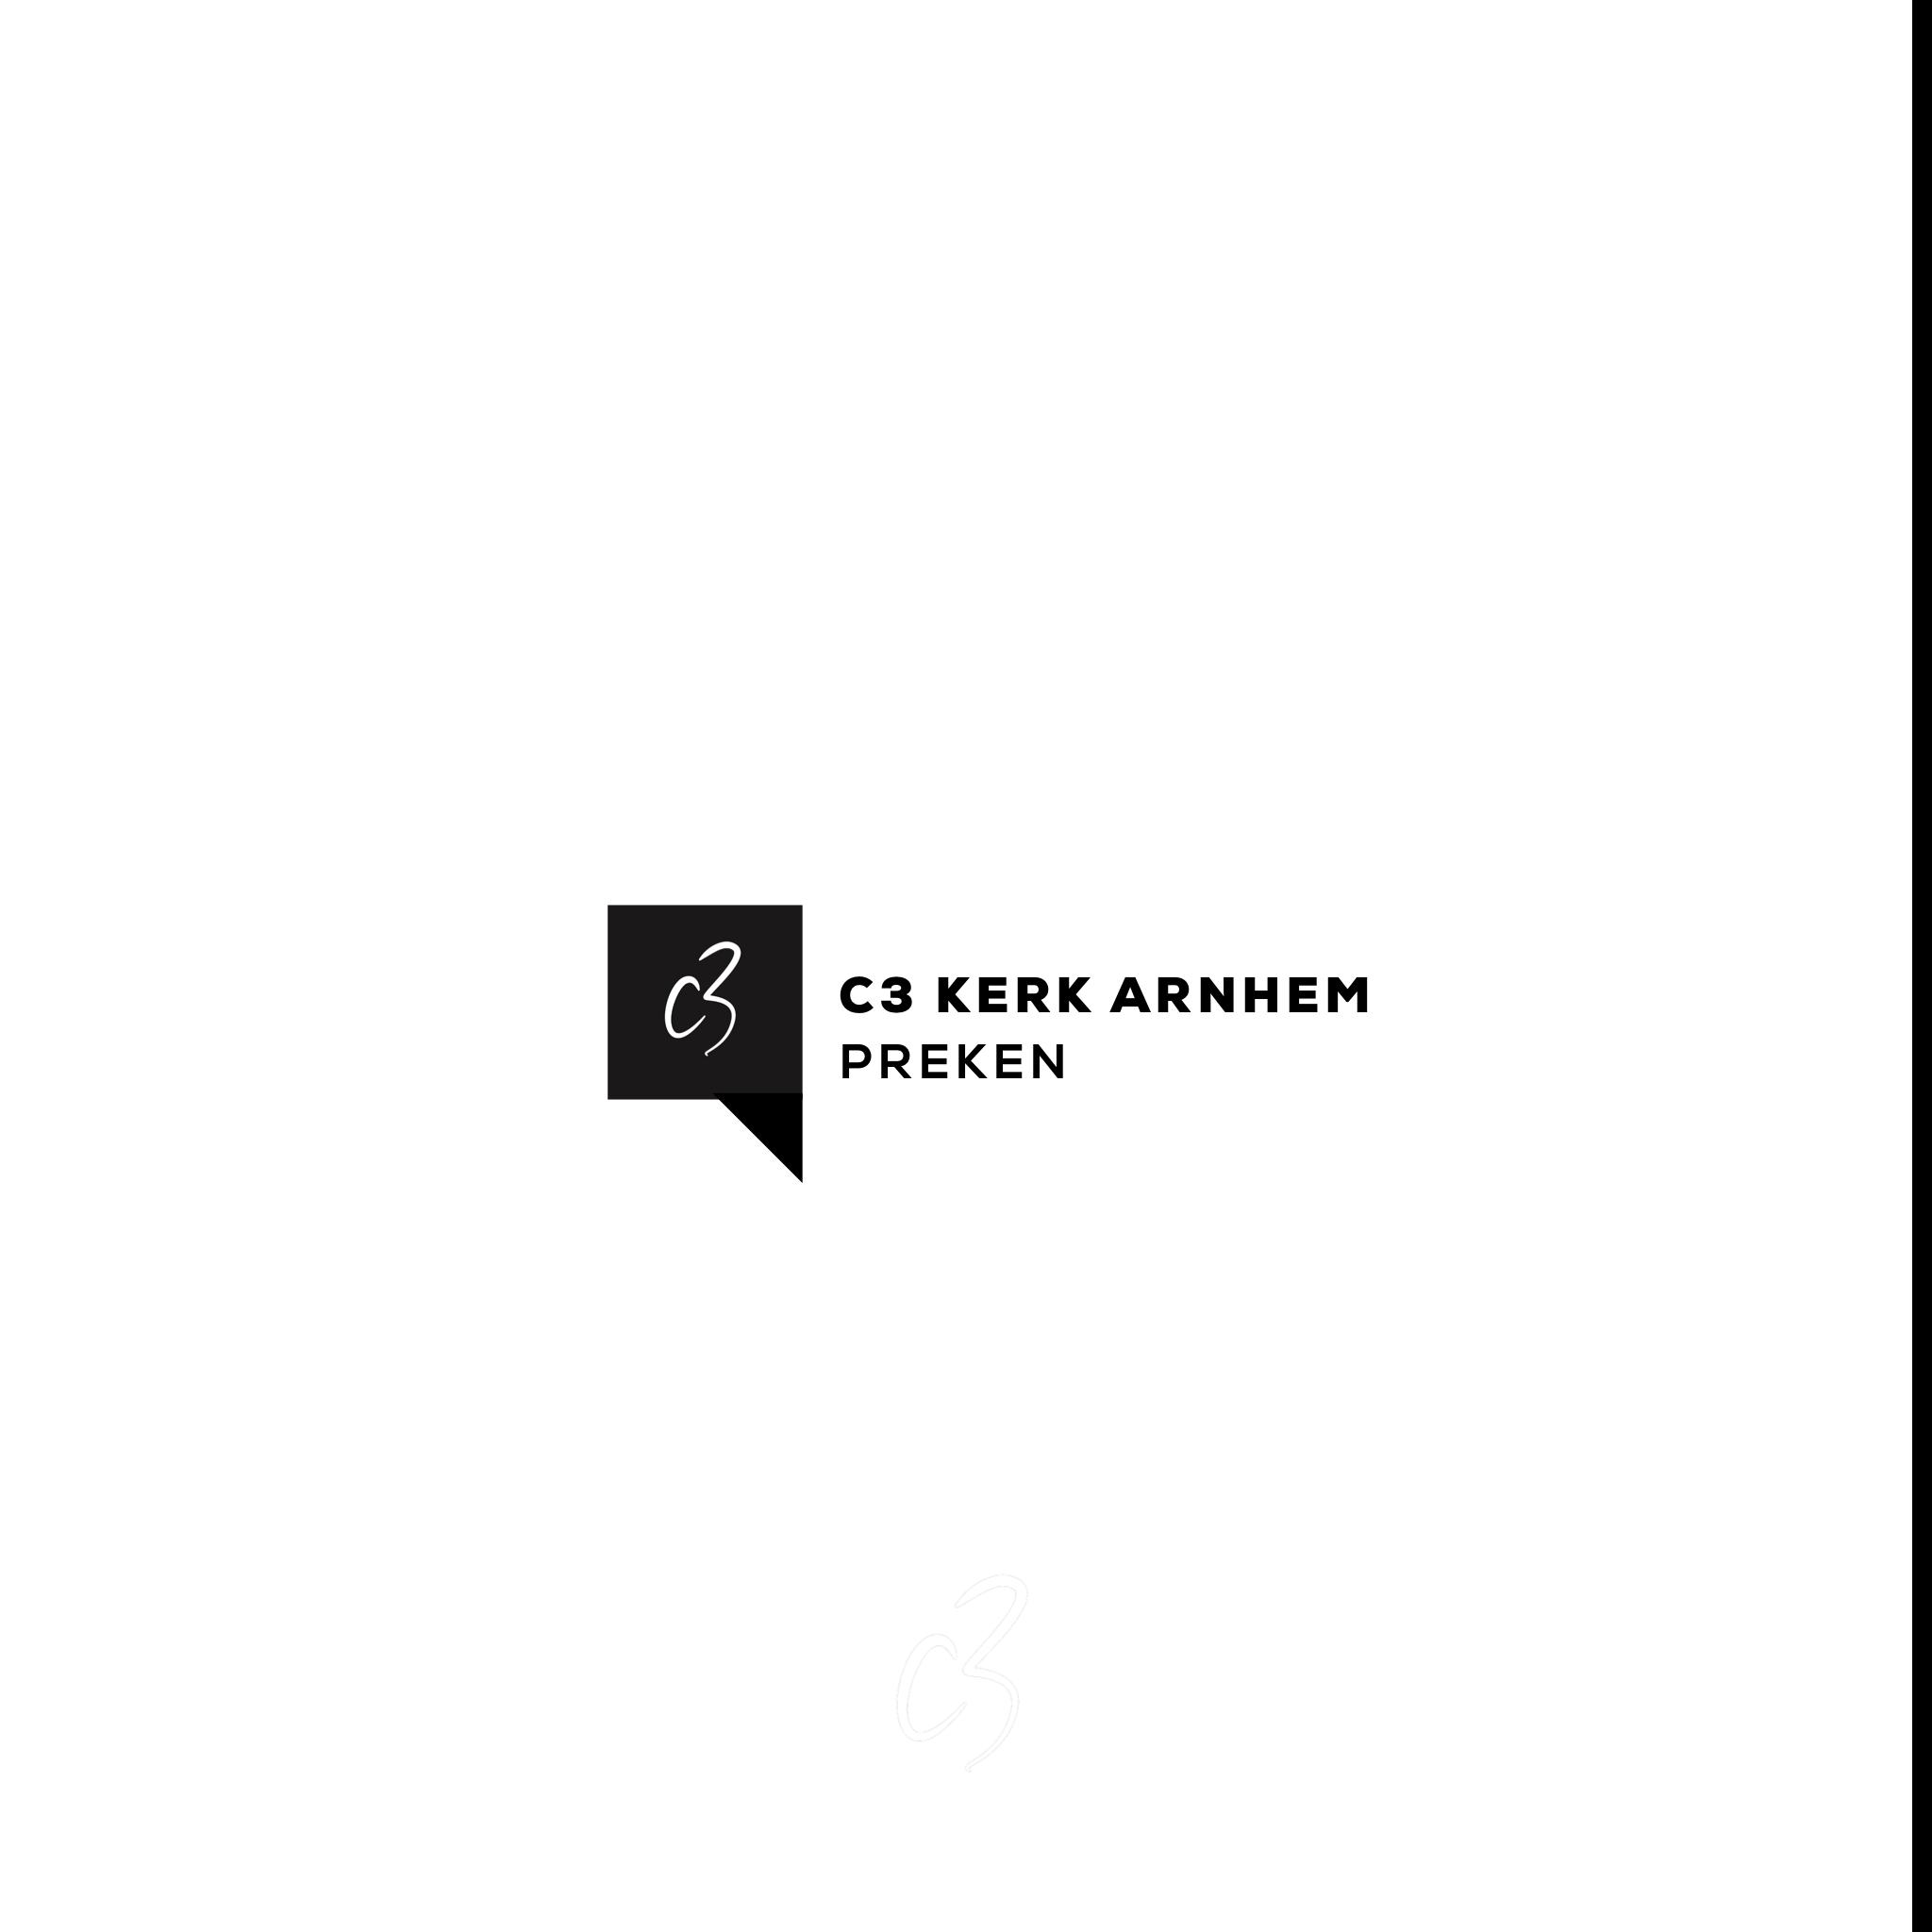 C3 Kerk Arnhem - Live opnamen logo